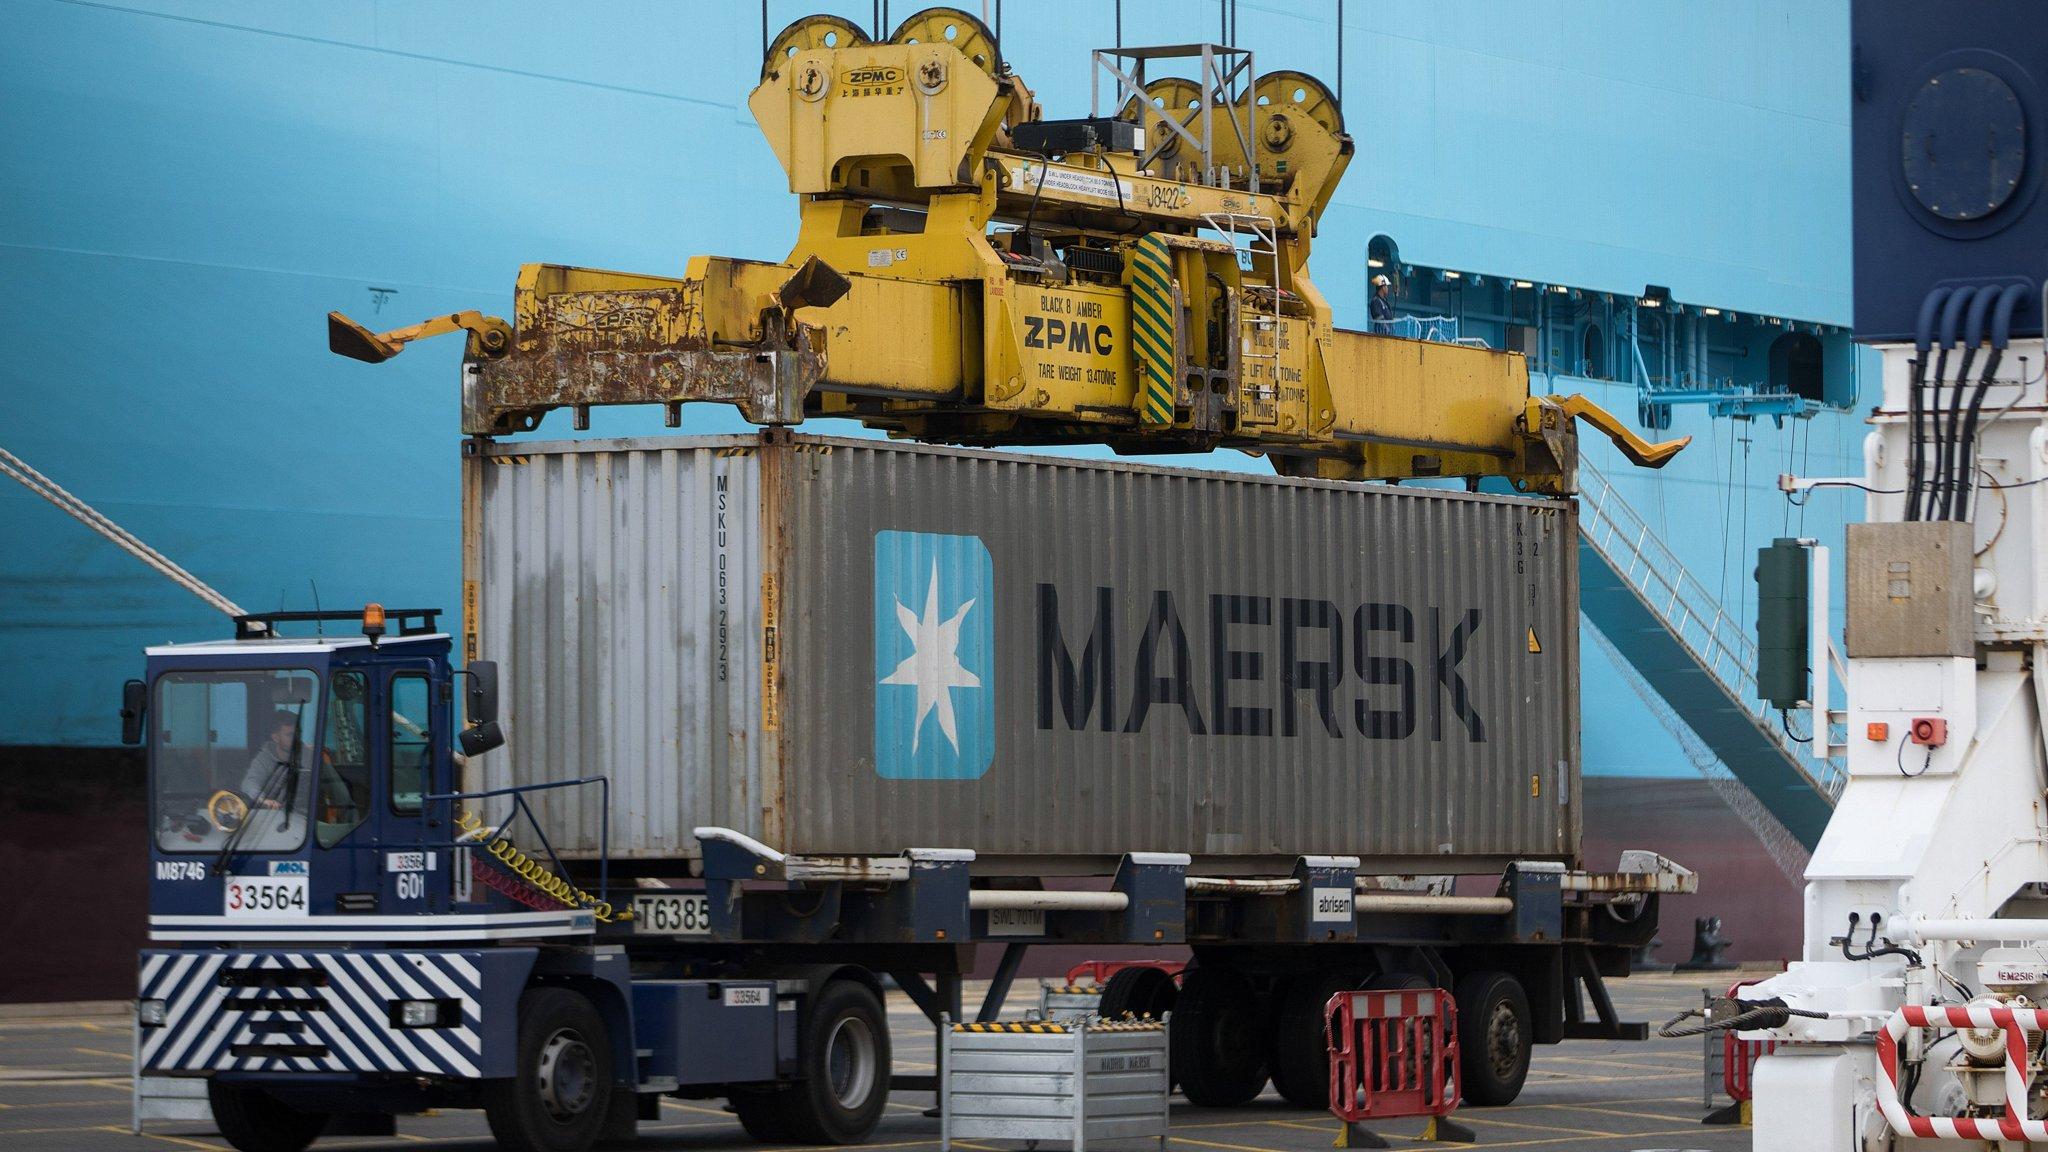 AP Moller-Maersk sells oil tanker business | Financial Times